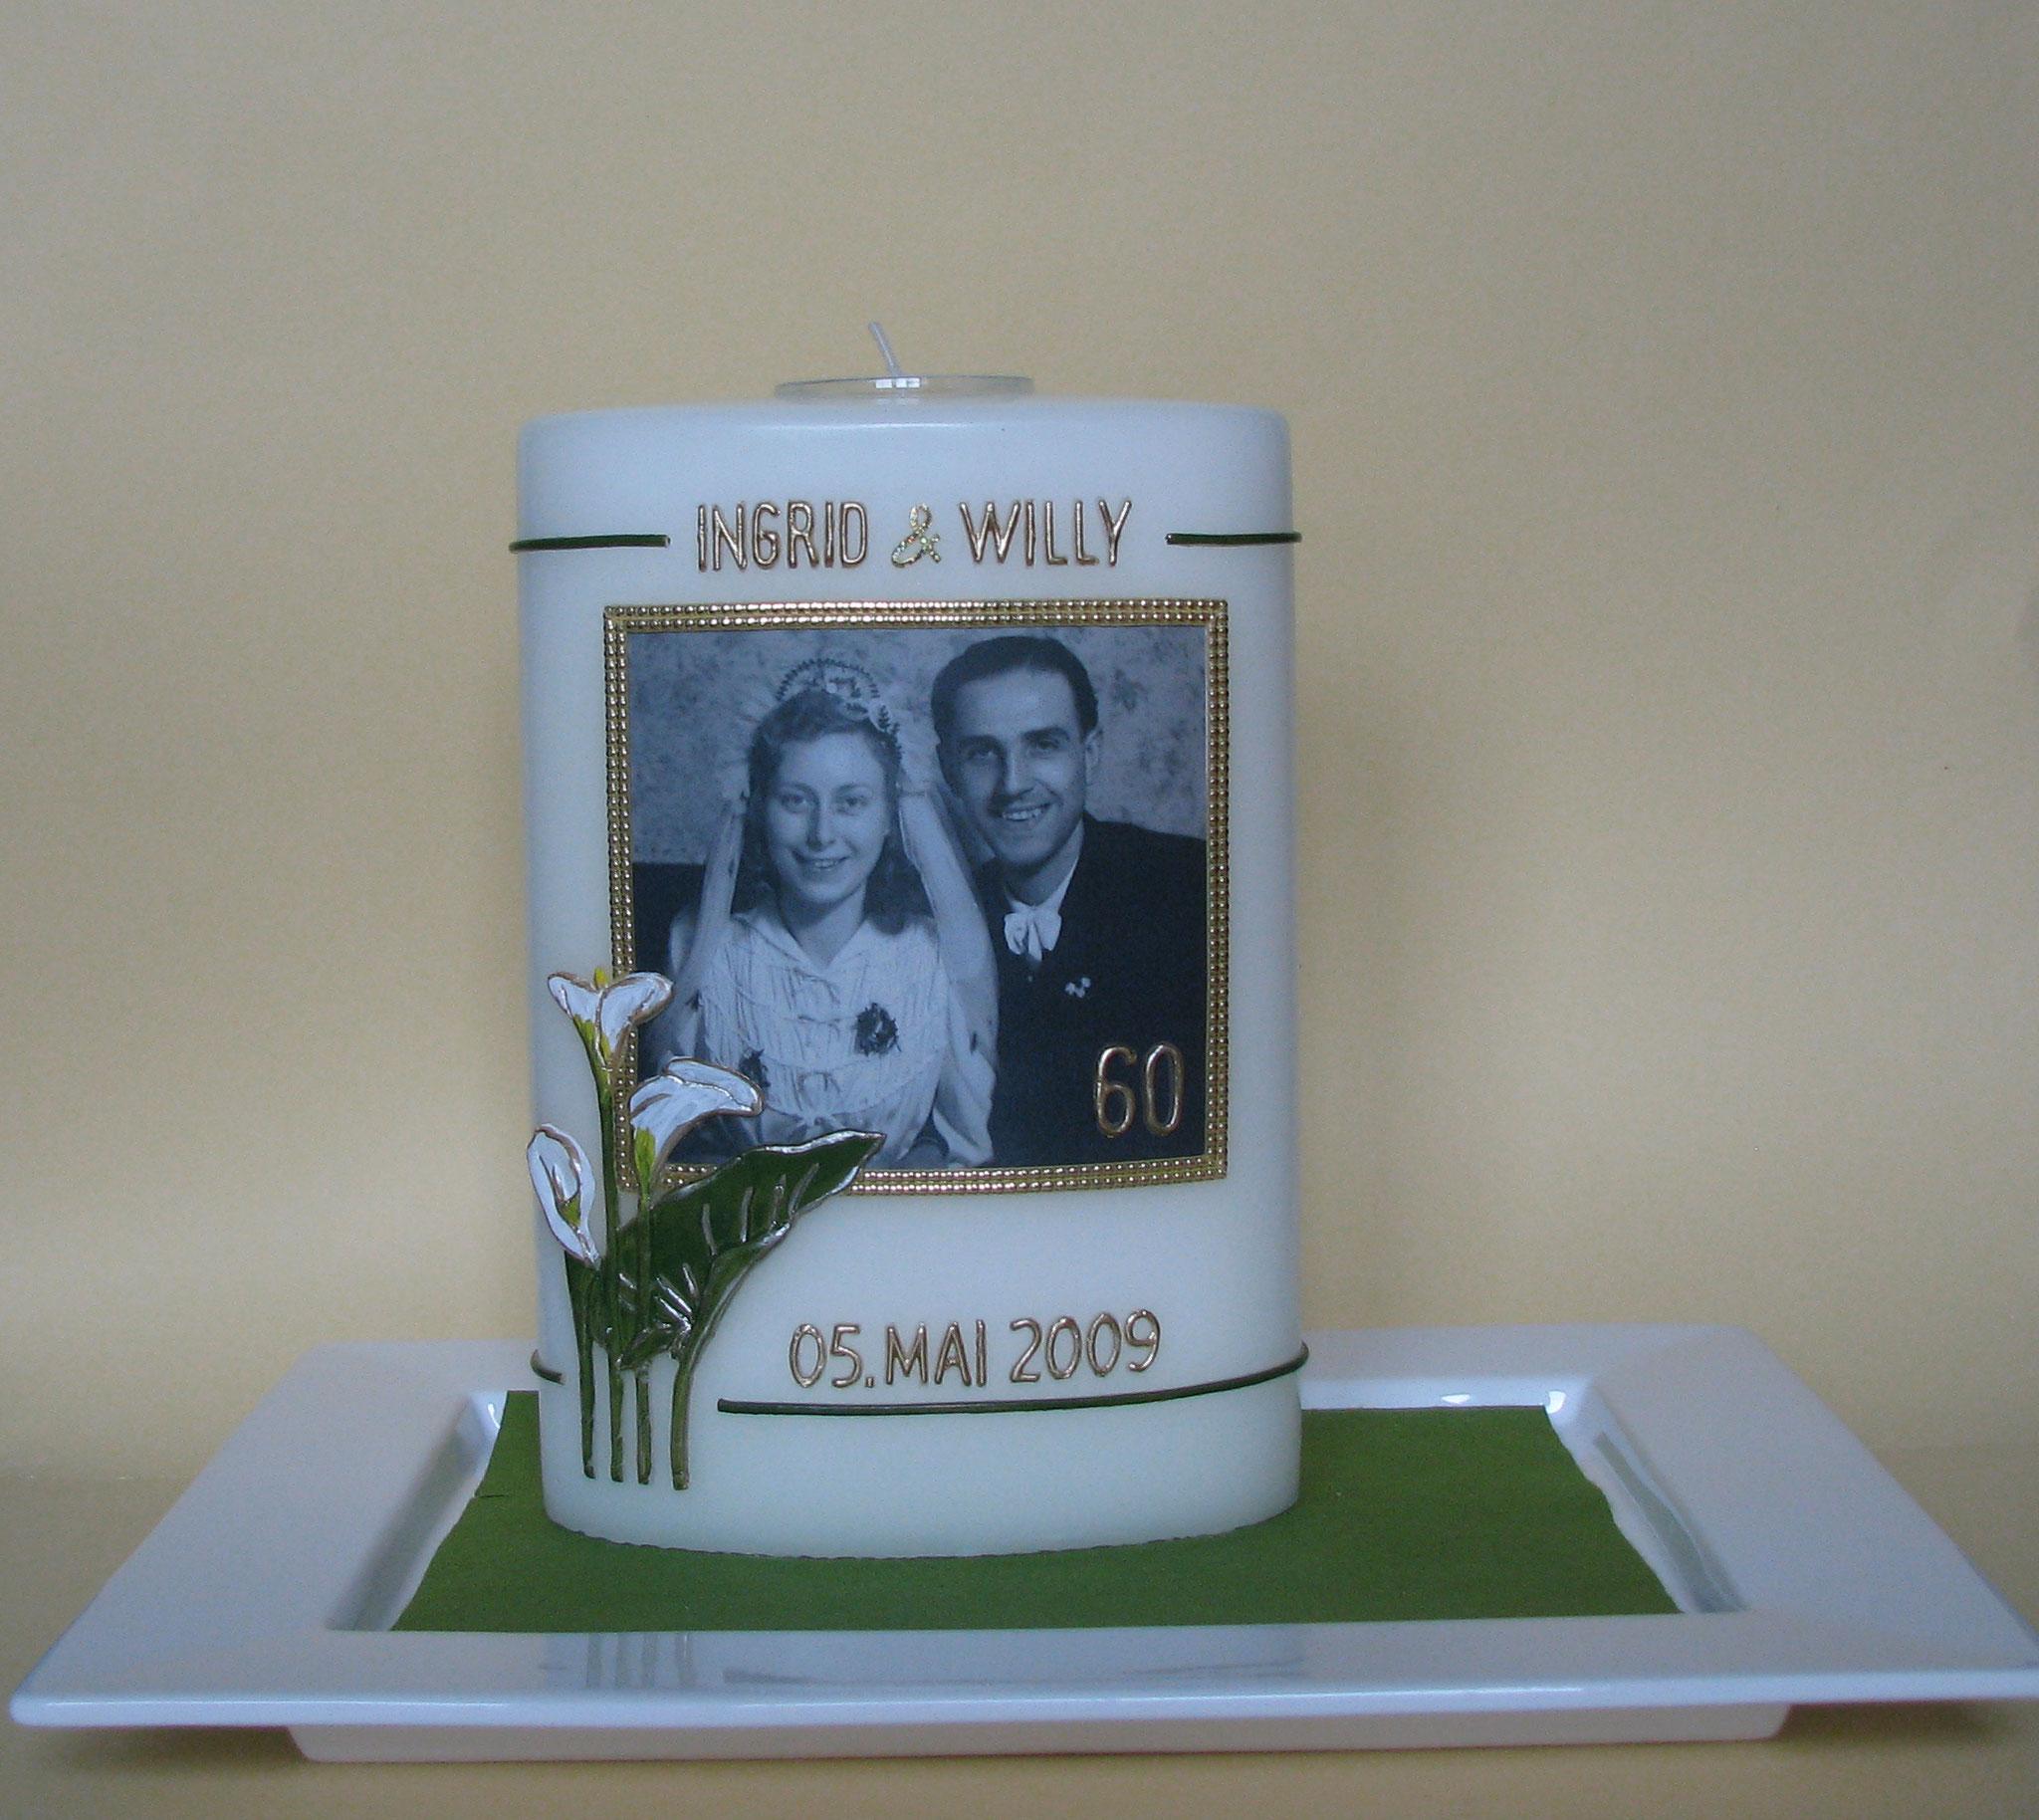 HO-2003, oval, HxB ca. 19 cm x 13,5 cm, Preis ca. € 45,-- + Kosten für Foto